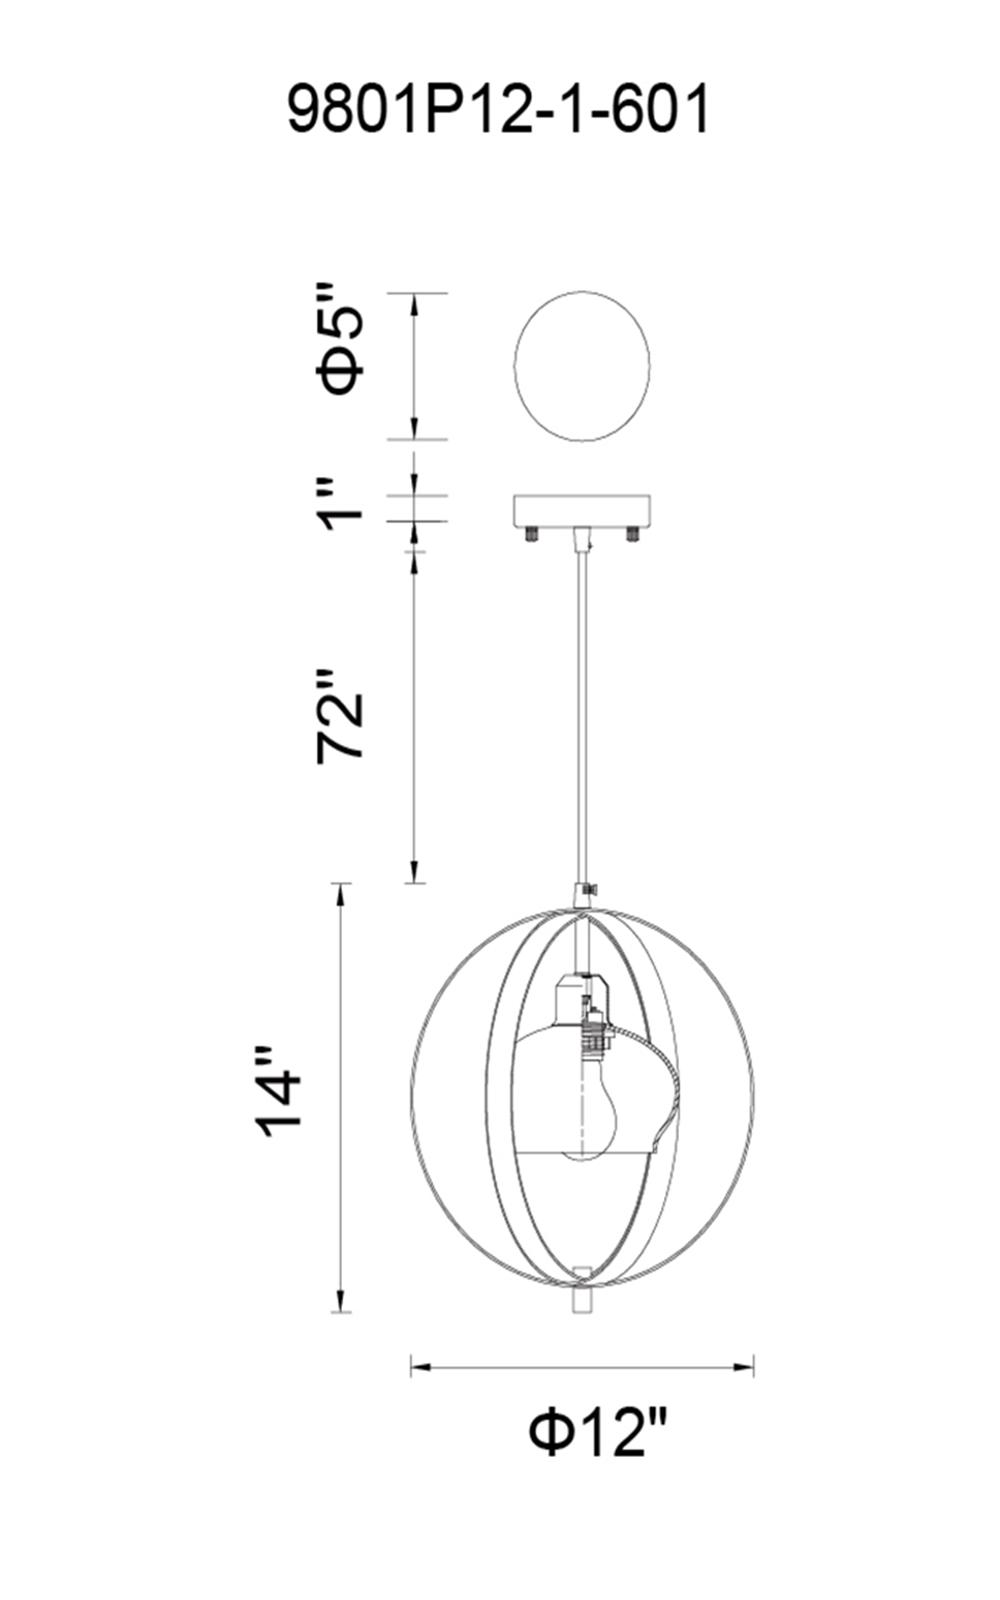 CWI Lighting Dahlia 1 Light Down Mini Pendant With Antique Bronze Model: 9801P12-1-604 Line Drawing